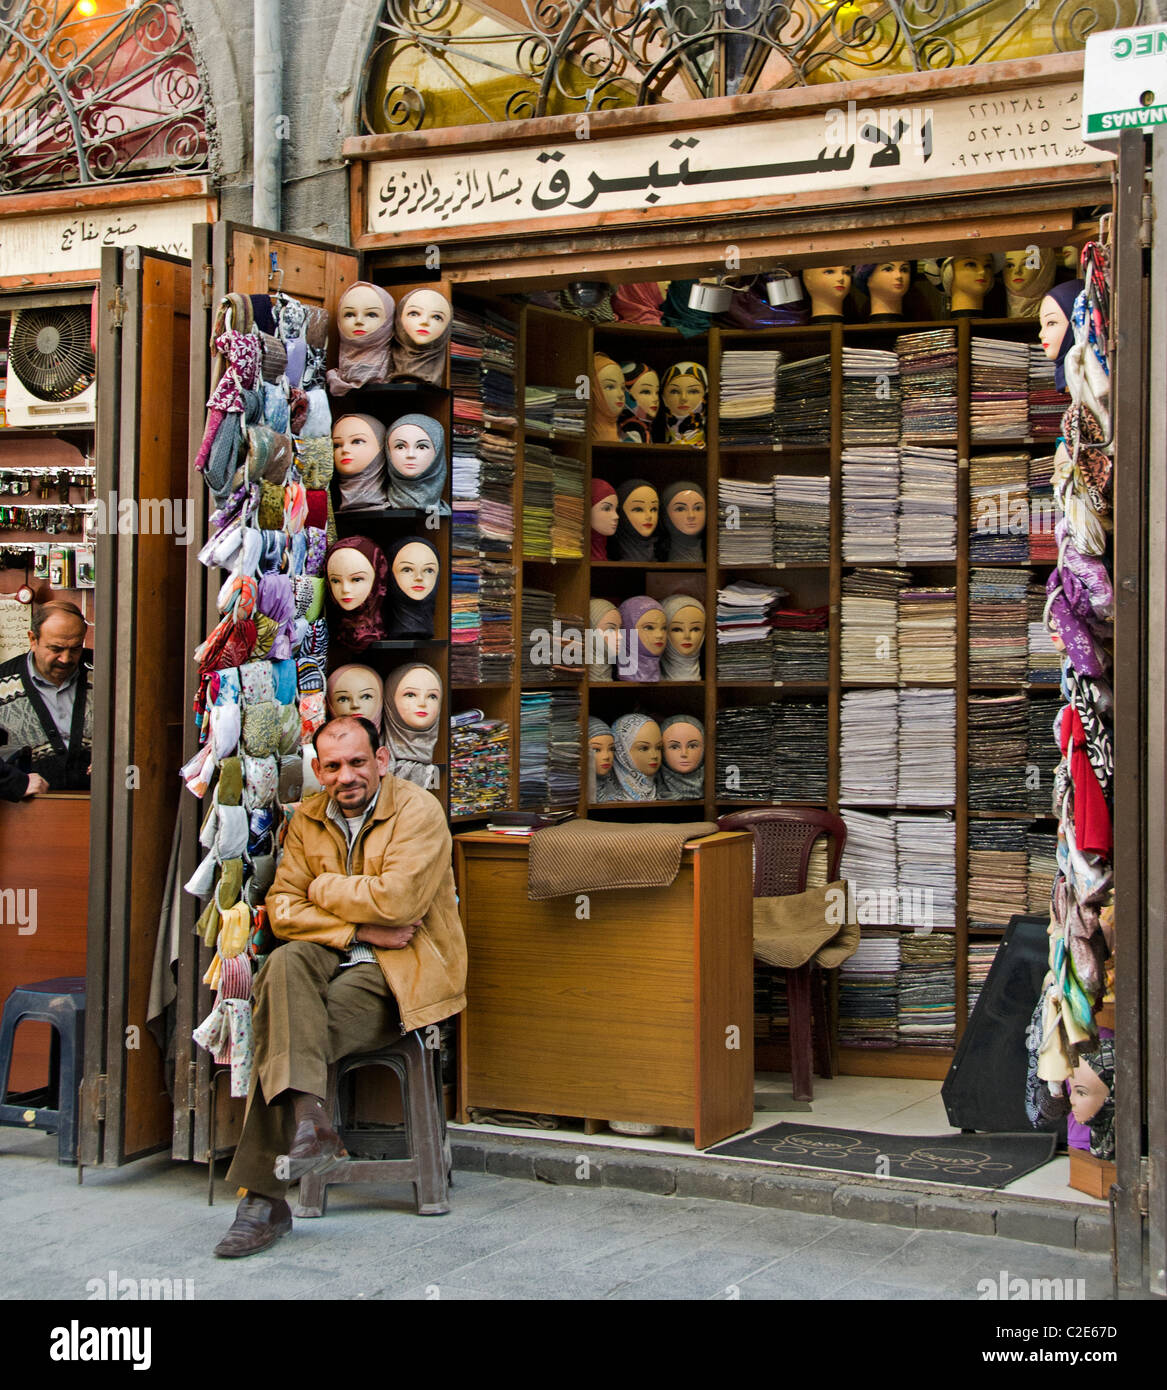 Damas Syrie Souk Bazar chiffon robe vêtements de soie draperie Photo Stock